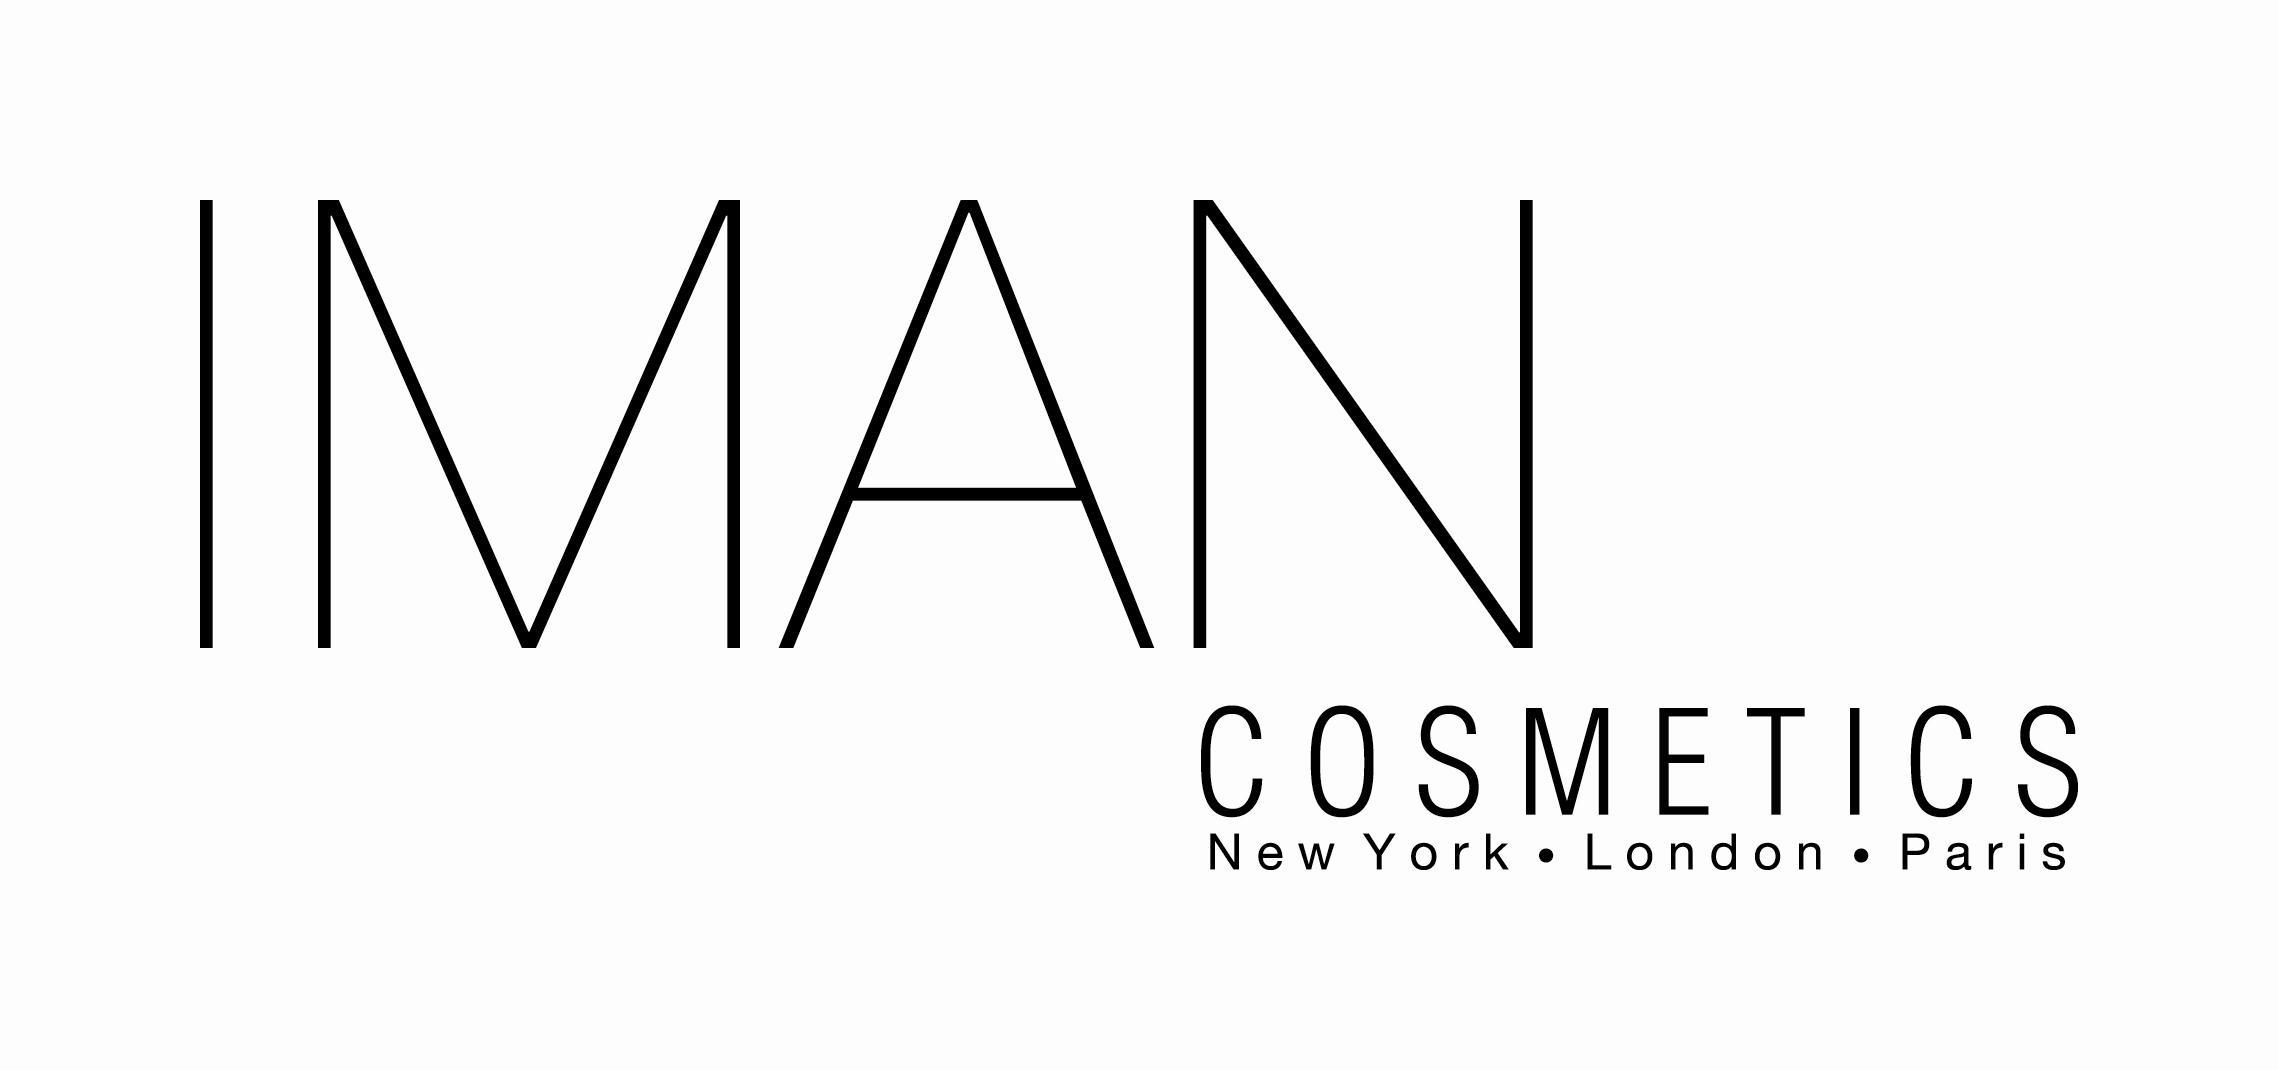 Iman Hires Logo Embrace Her Legacy Inspiring